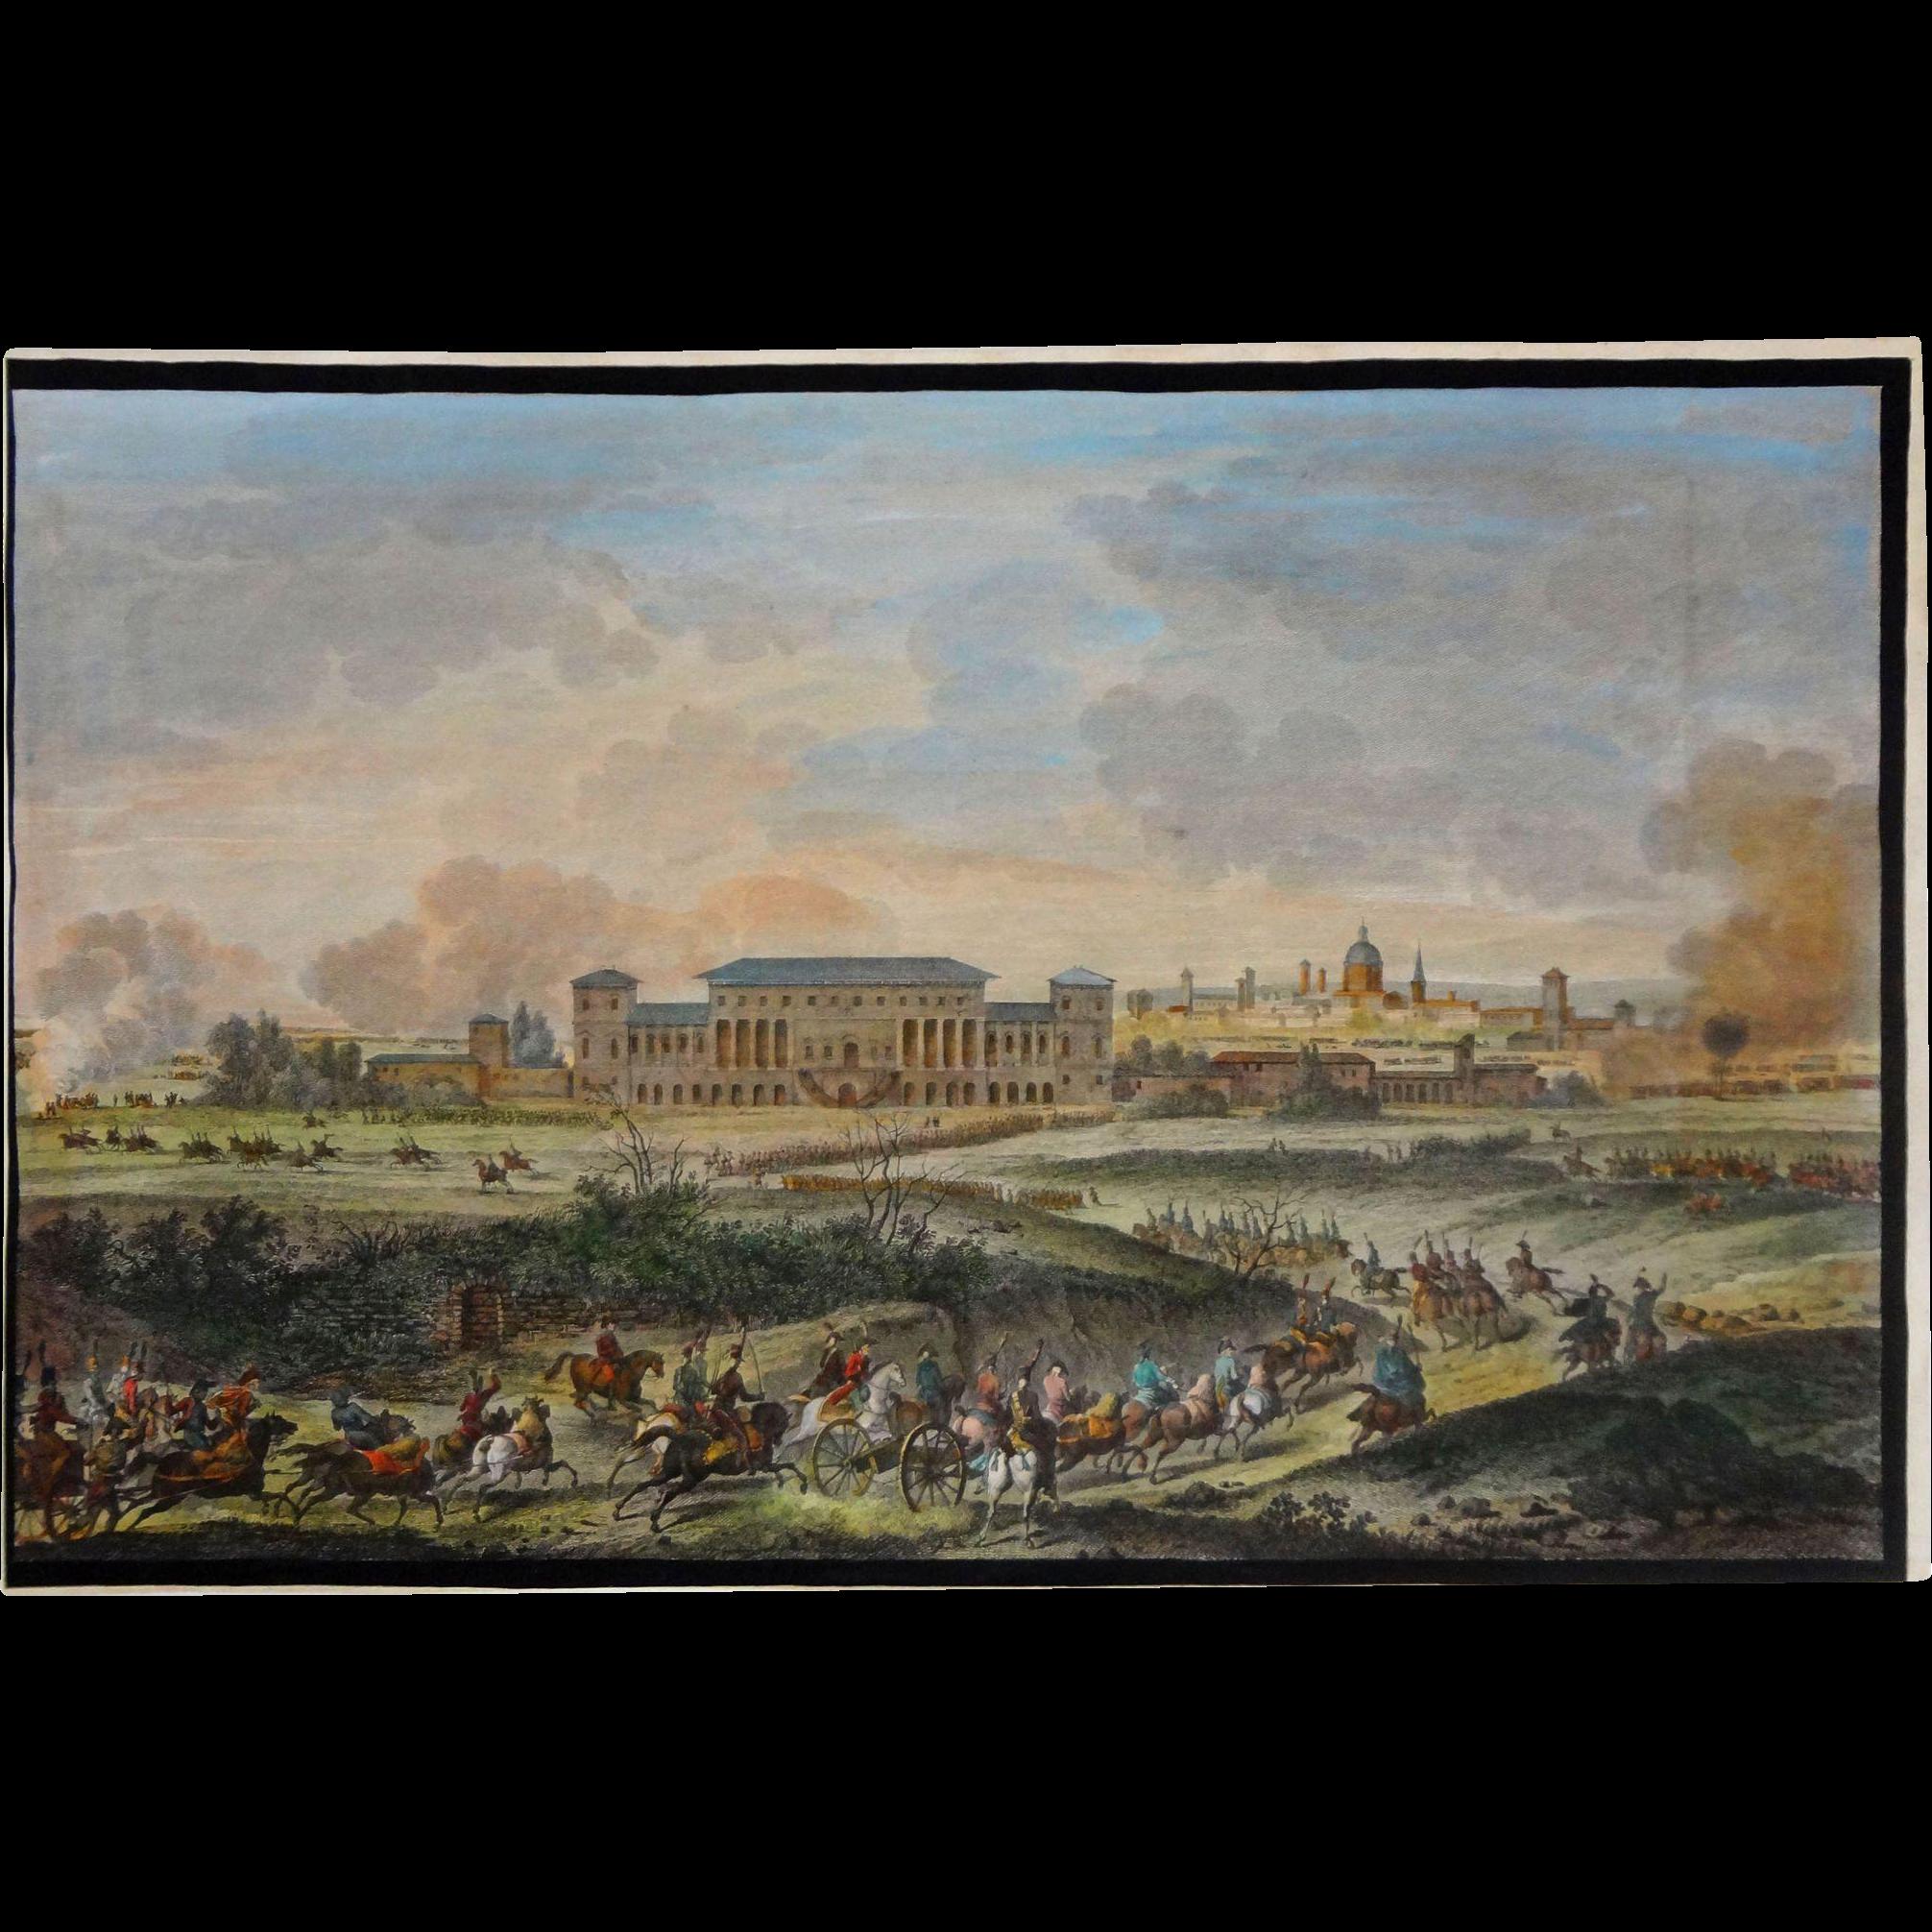 The Italian Campaigns Engraving Bataille de la Favorite after Vernet - c. 19th Century, France